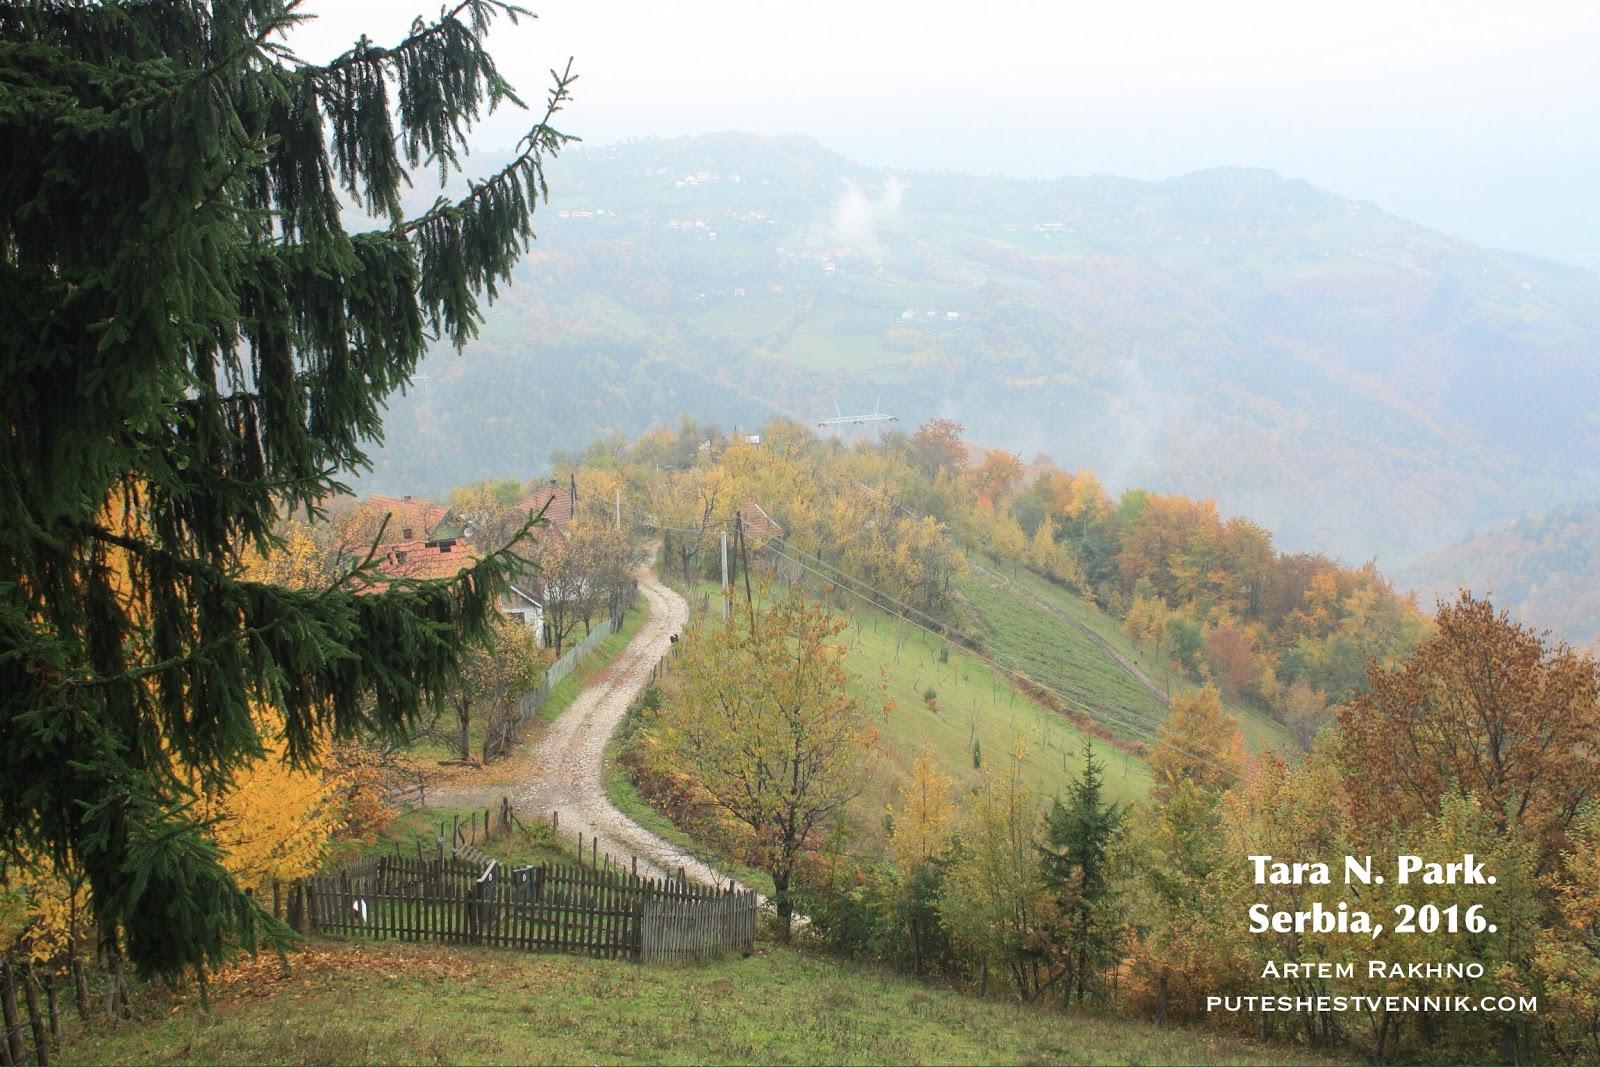 Проселочная дорога в Сербии